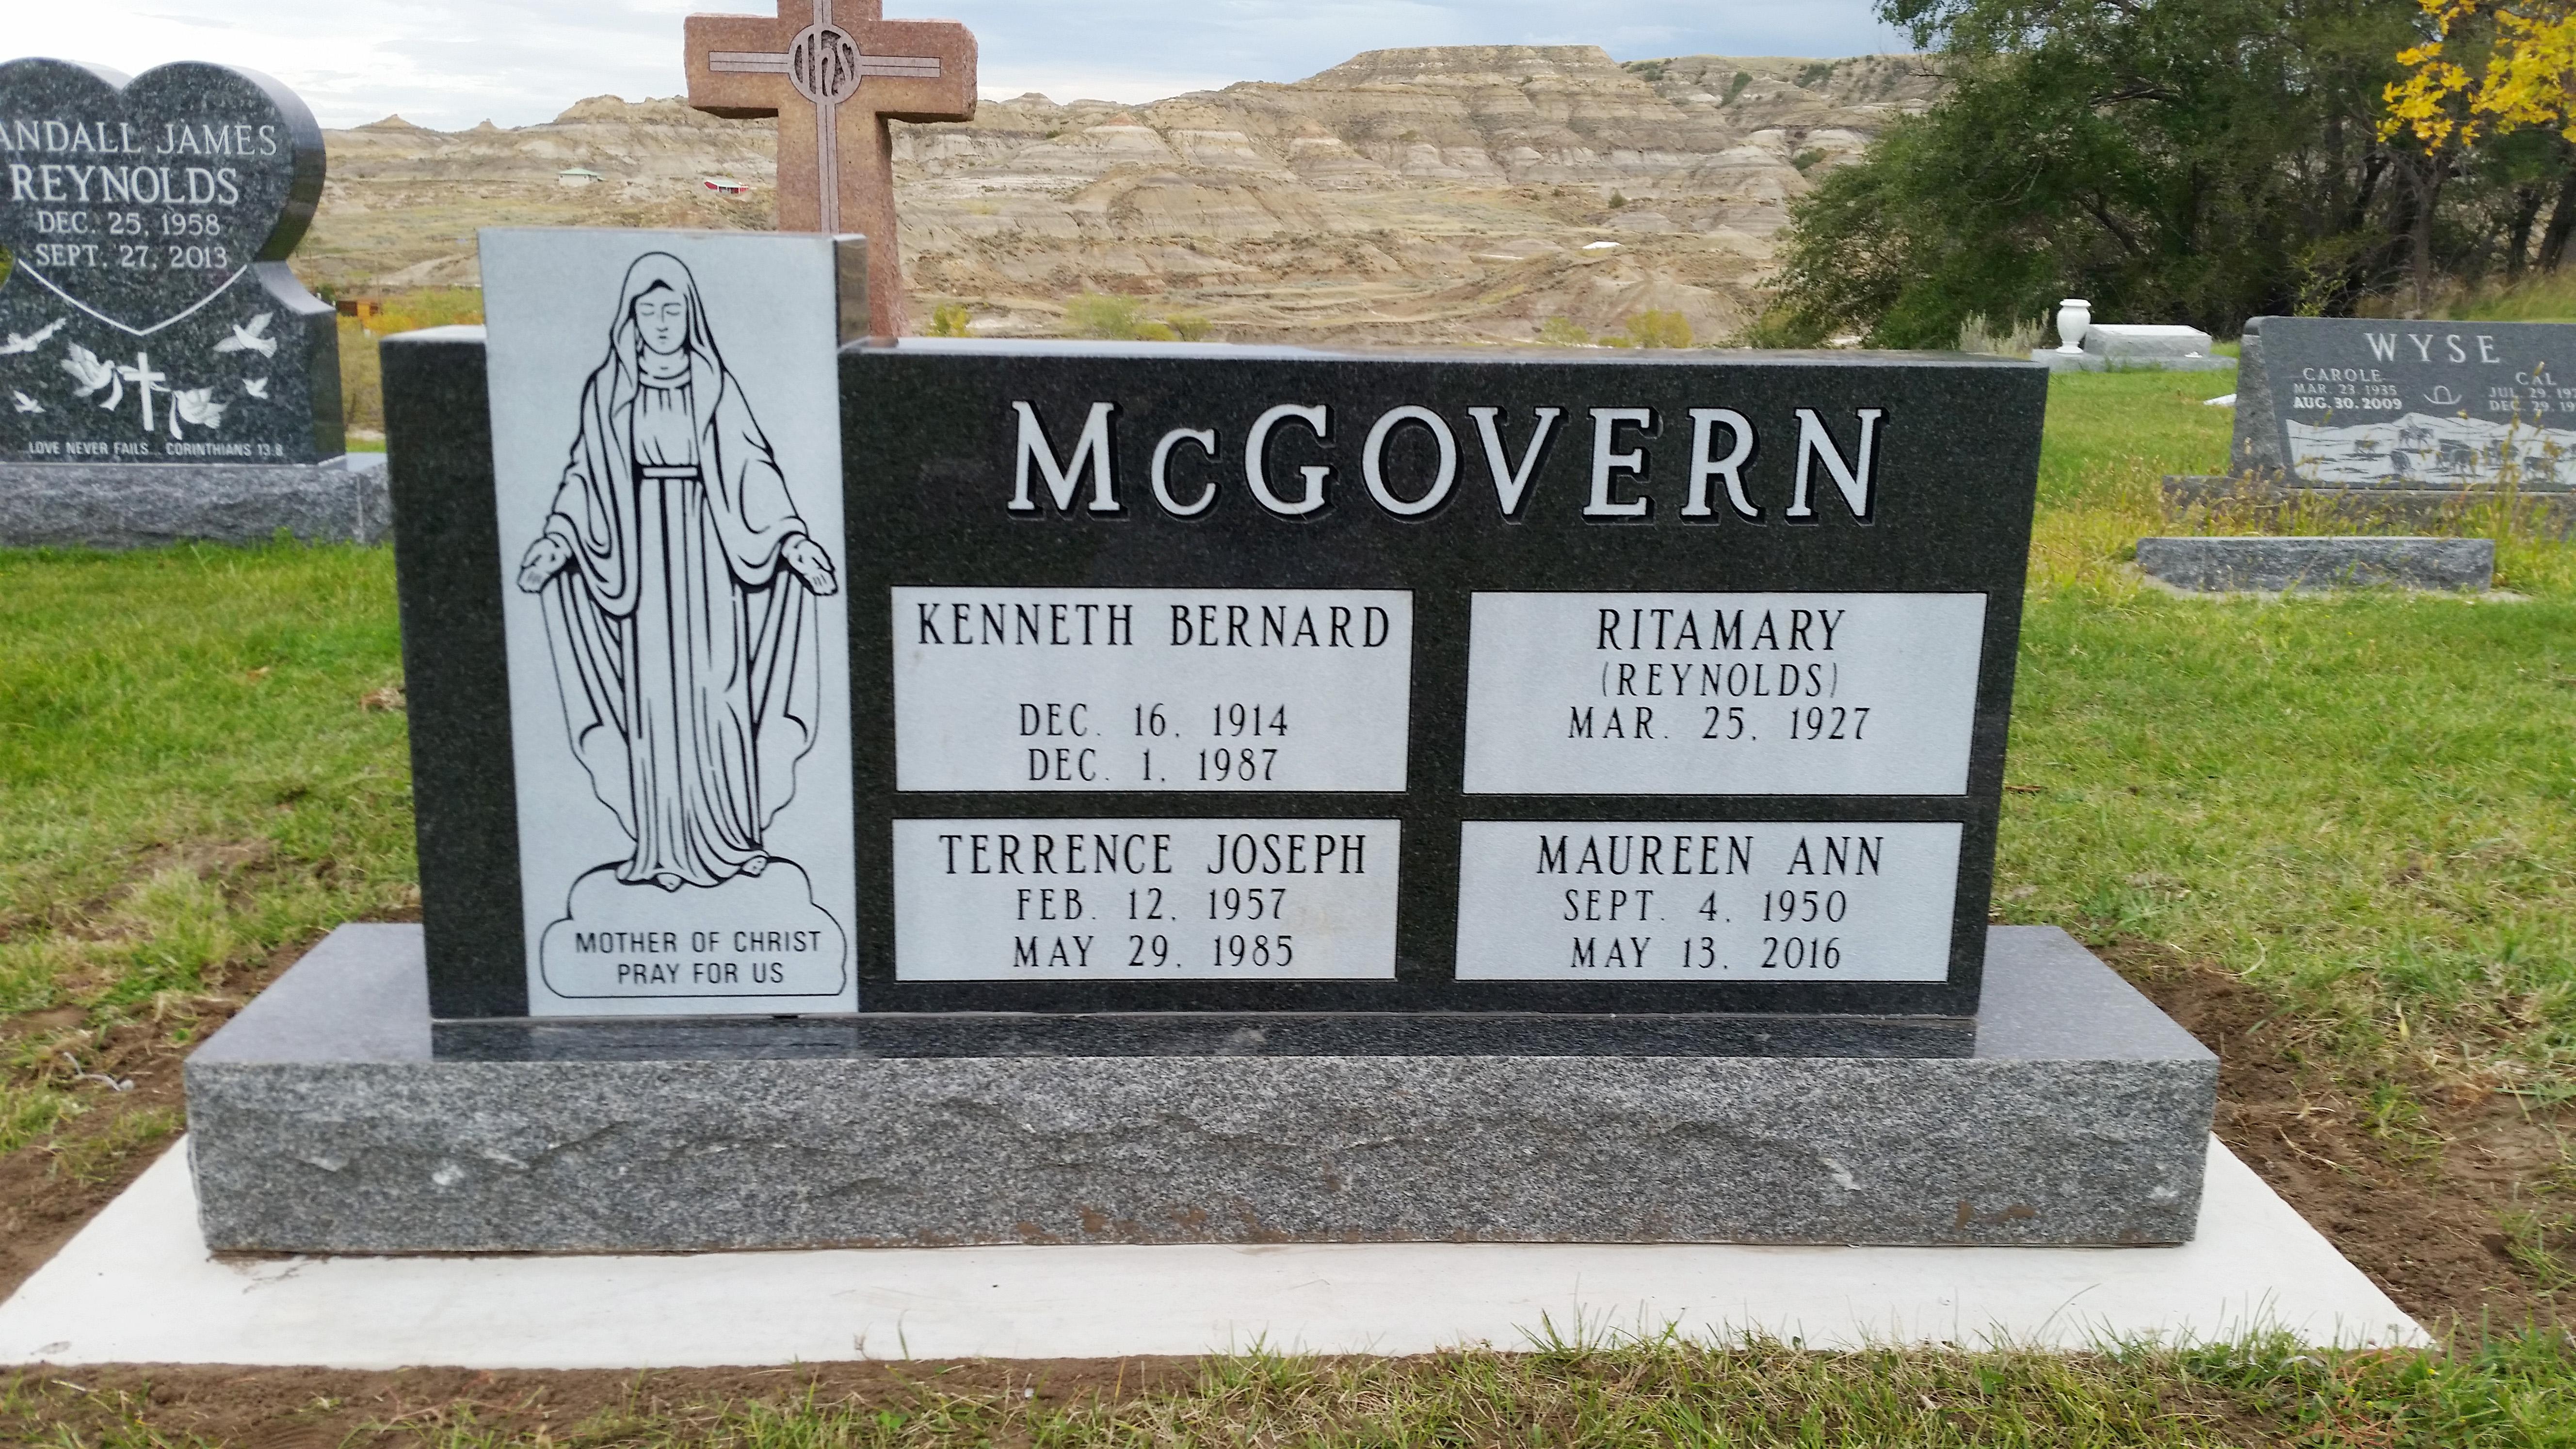 McGovernB